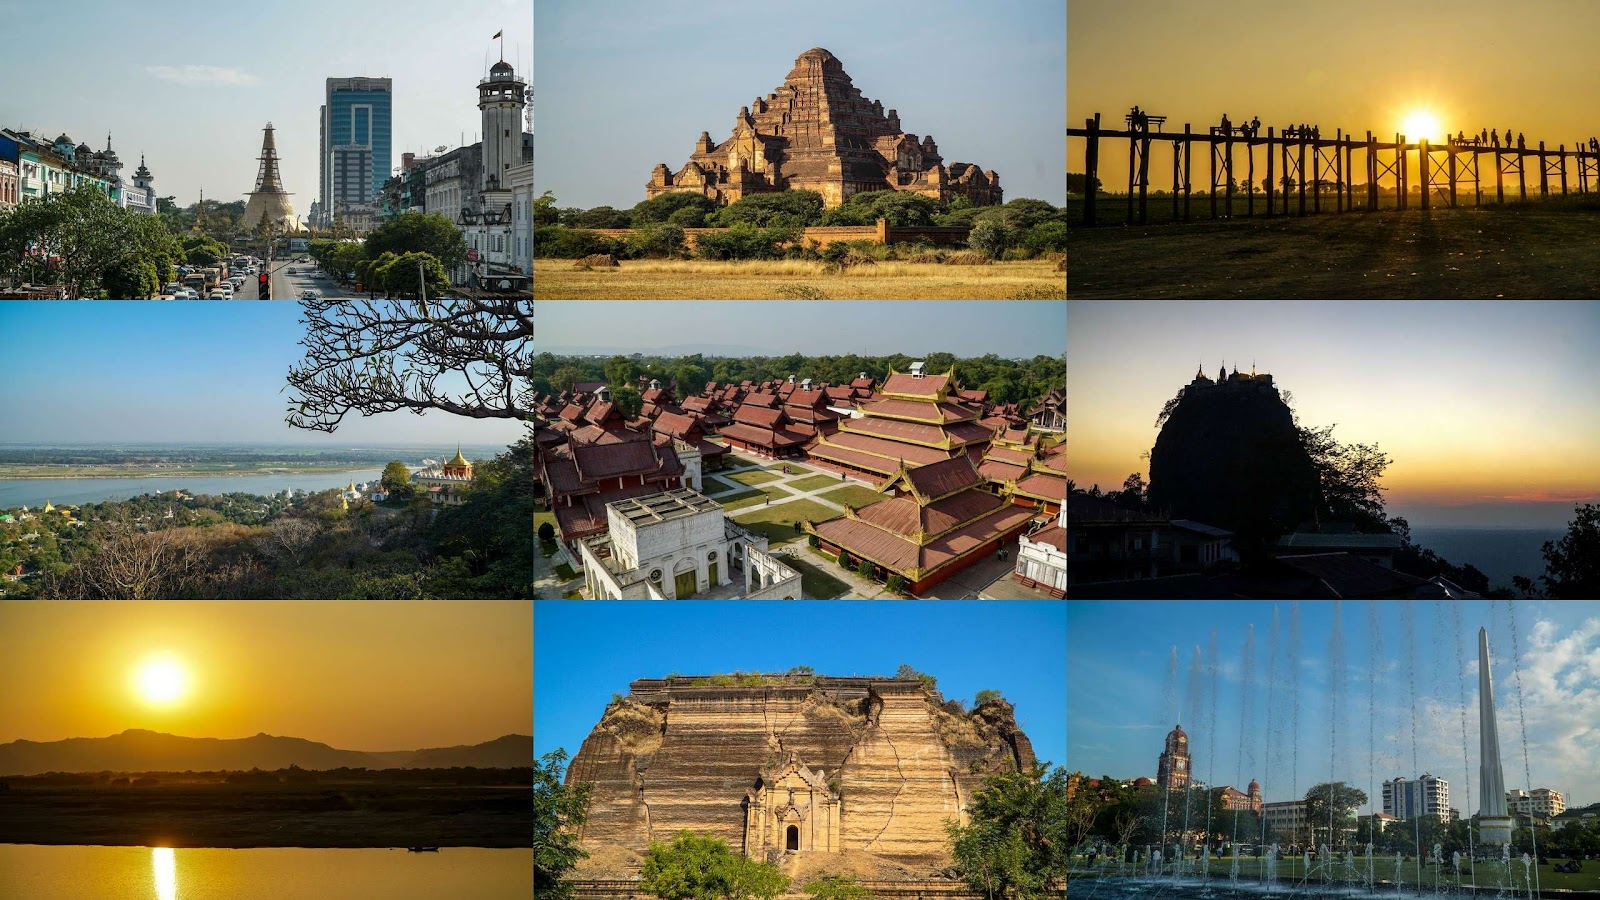 Yangon, Bagan & Mandalay, Myanmar Itinerary (8 days) | Eat